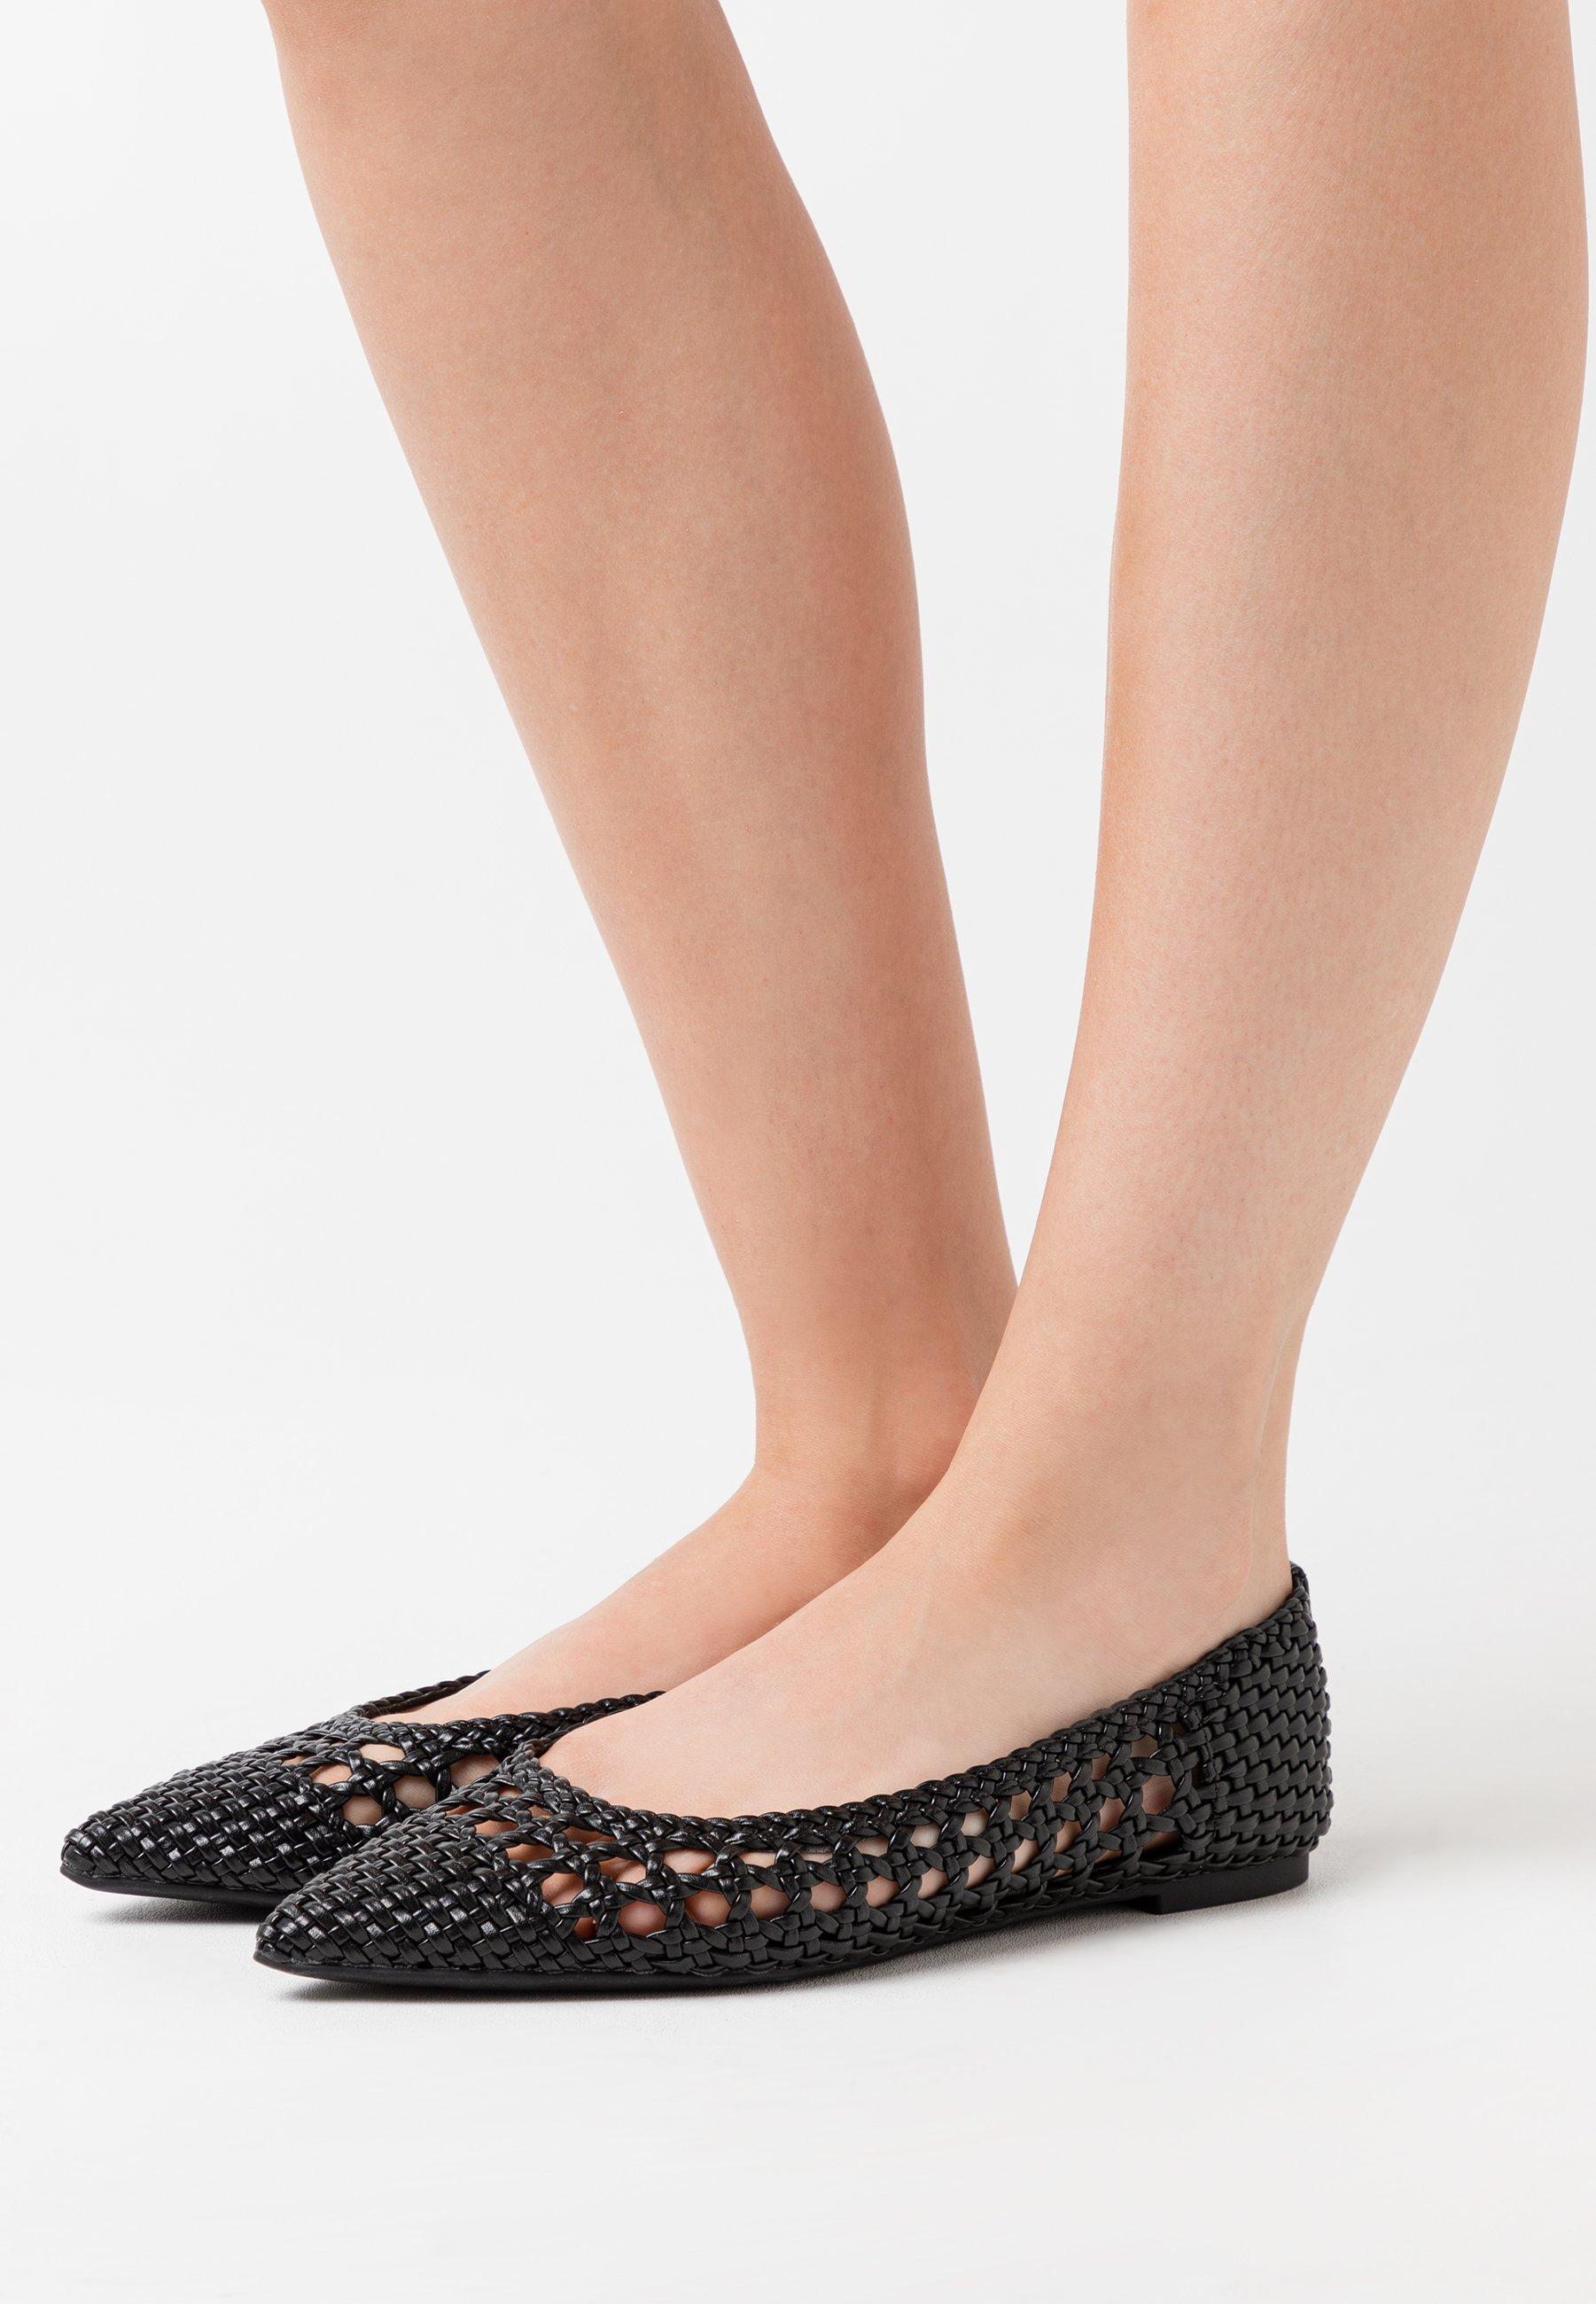 PARFOIS Ballerine - black - Scarpe da donna Freddo